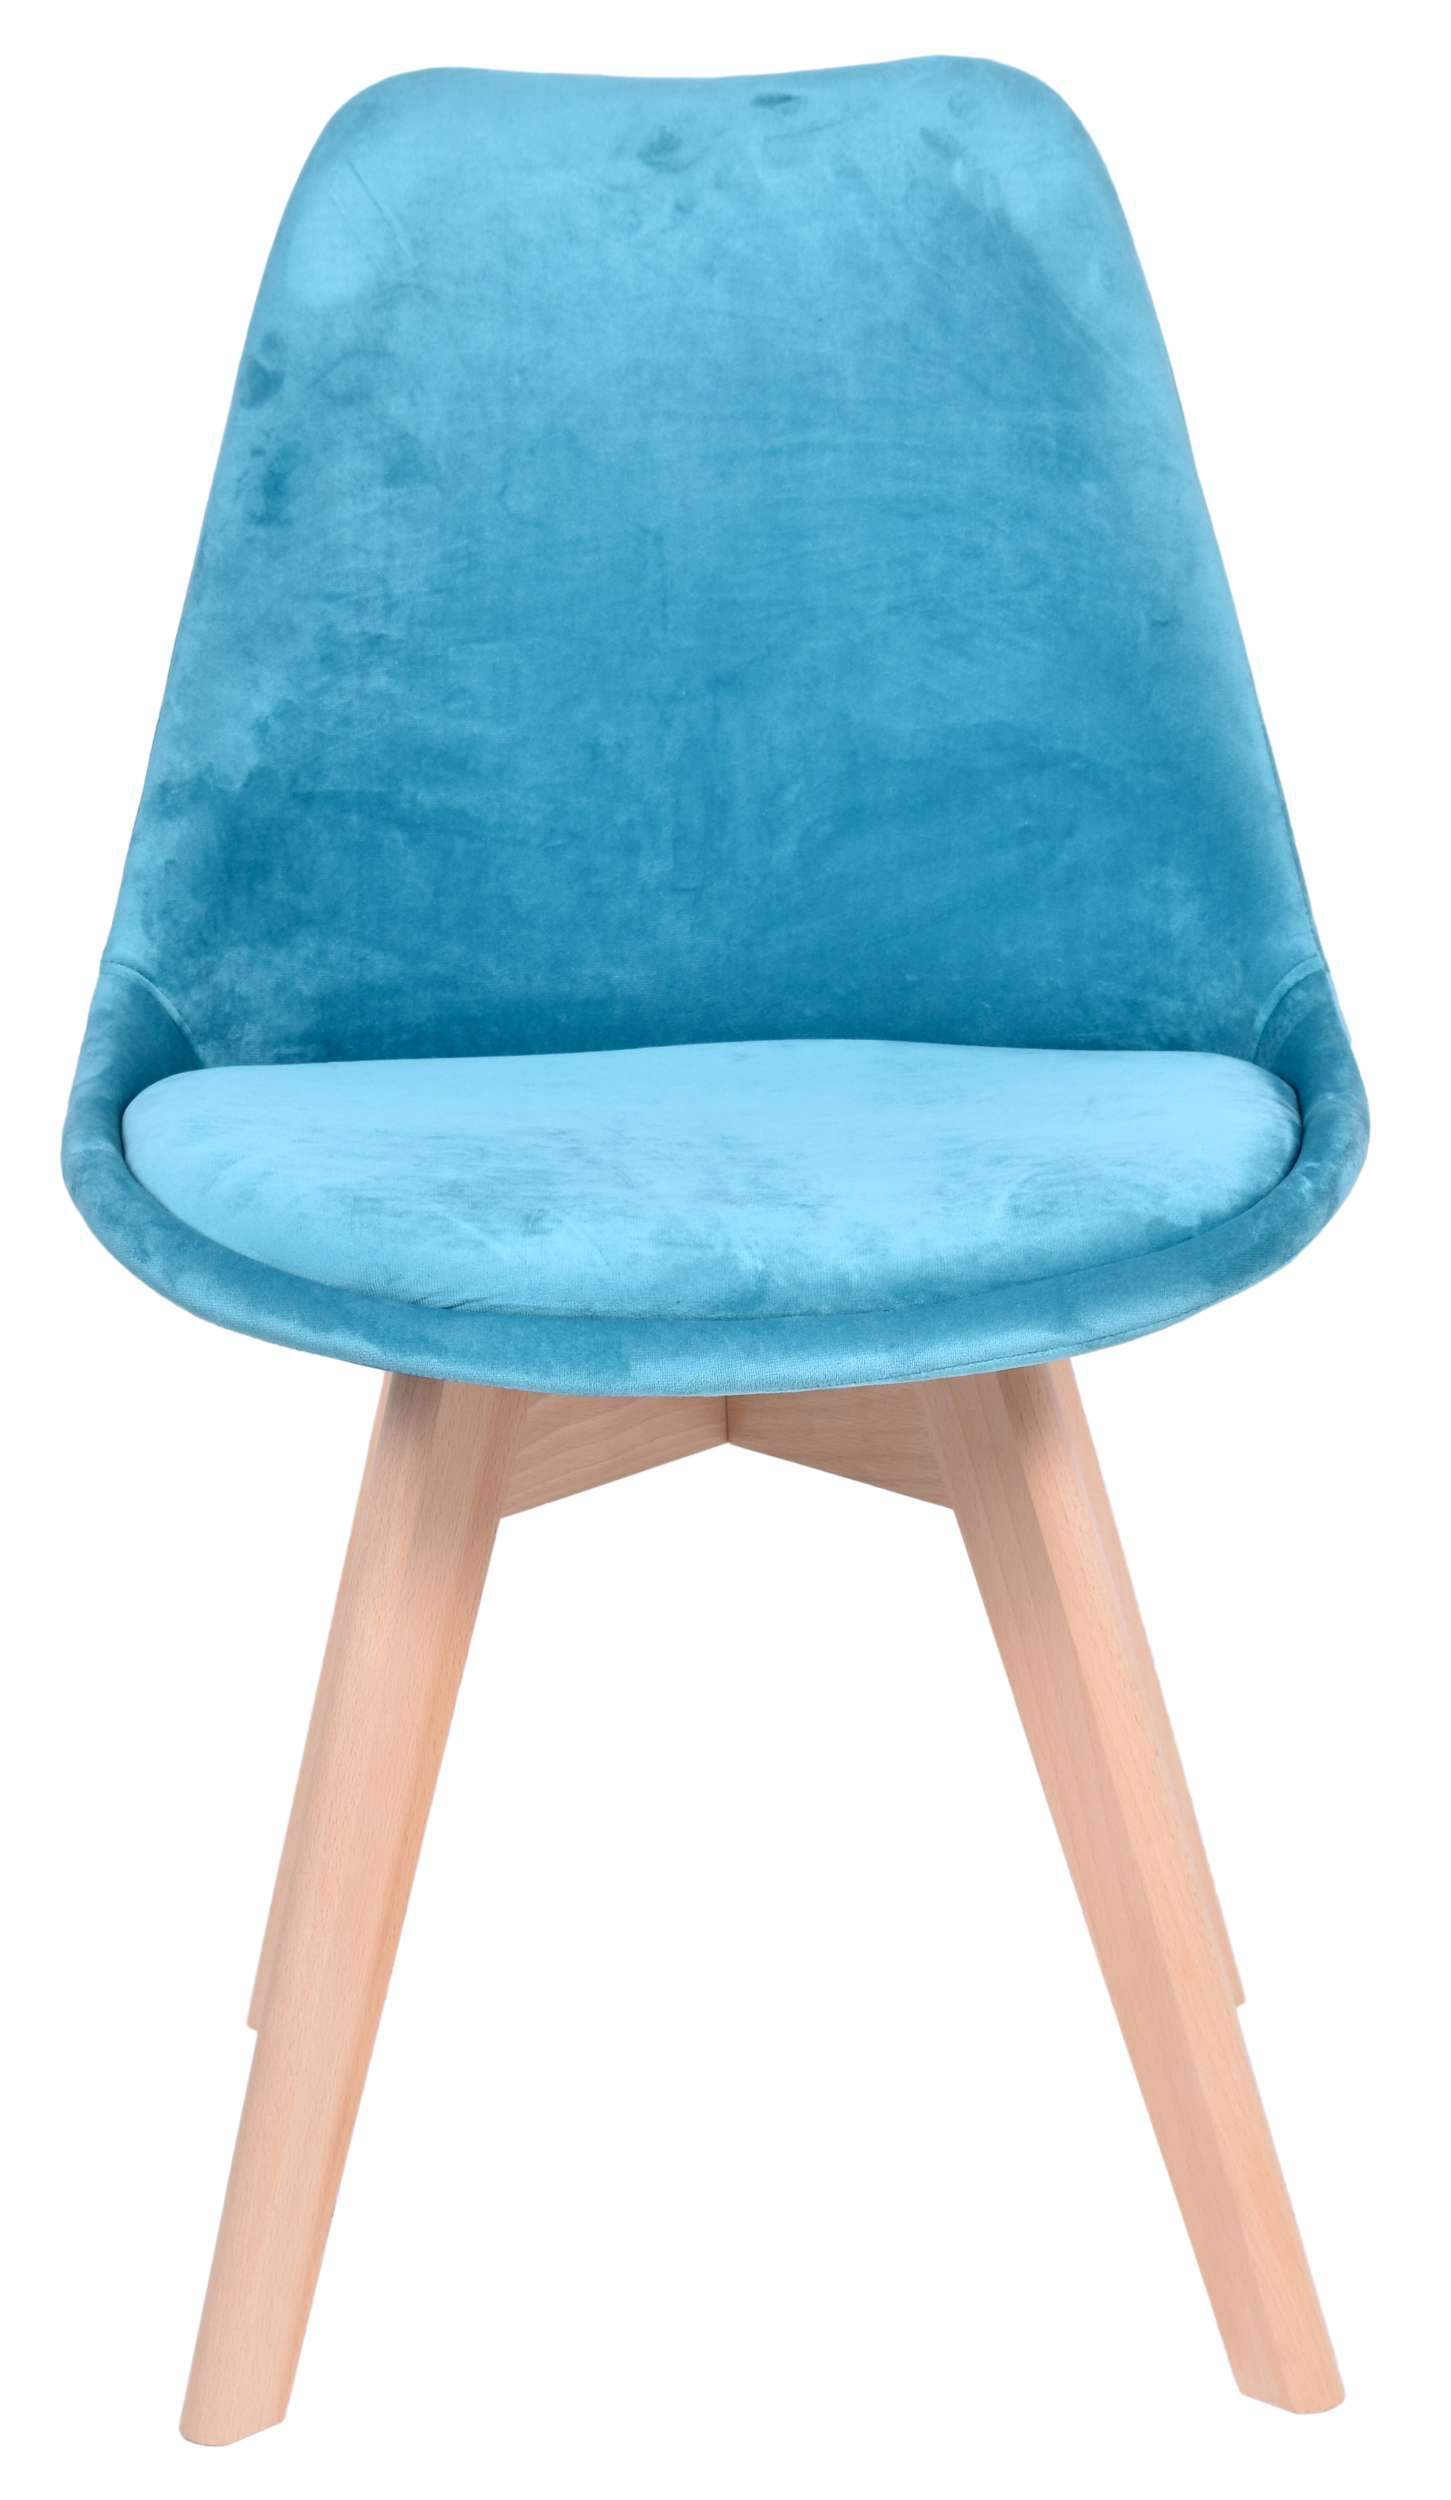 Krzesło tapicerowane Nantes Velvet morski   eHokery.pl